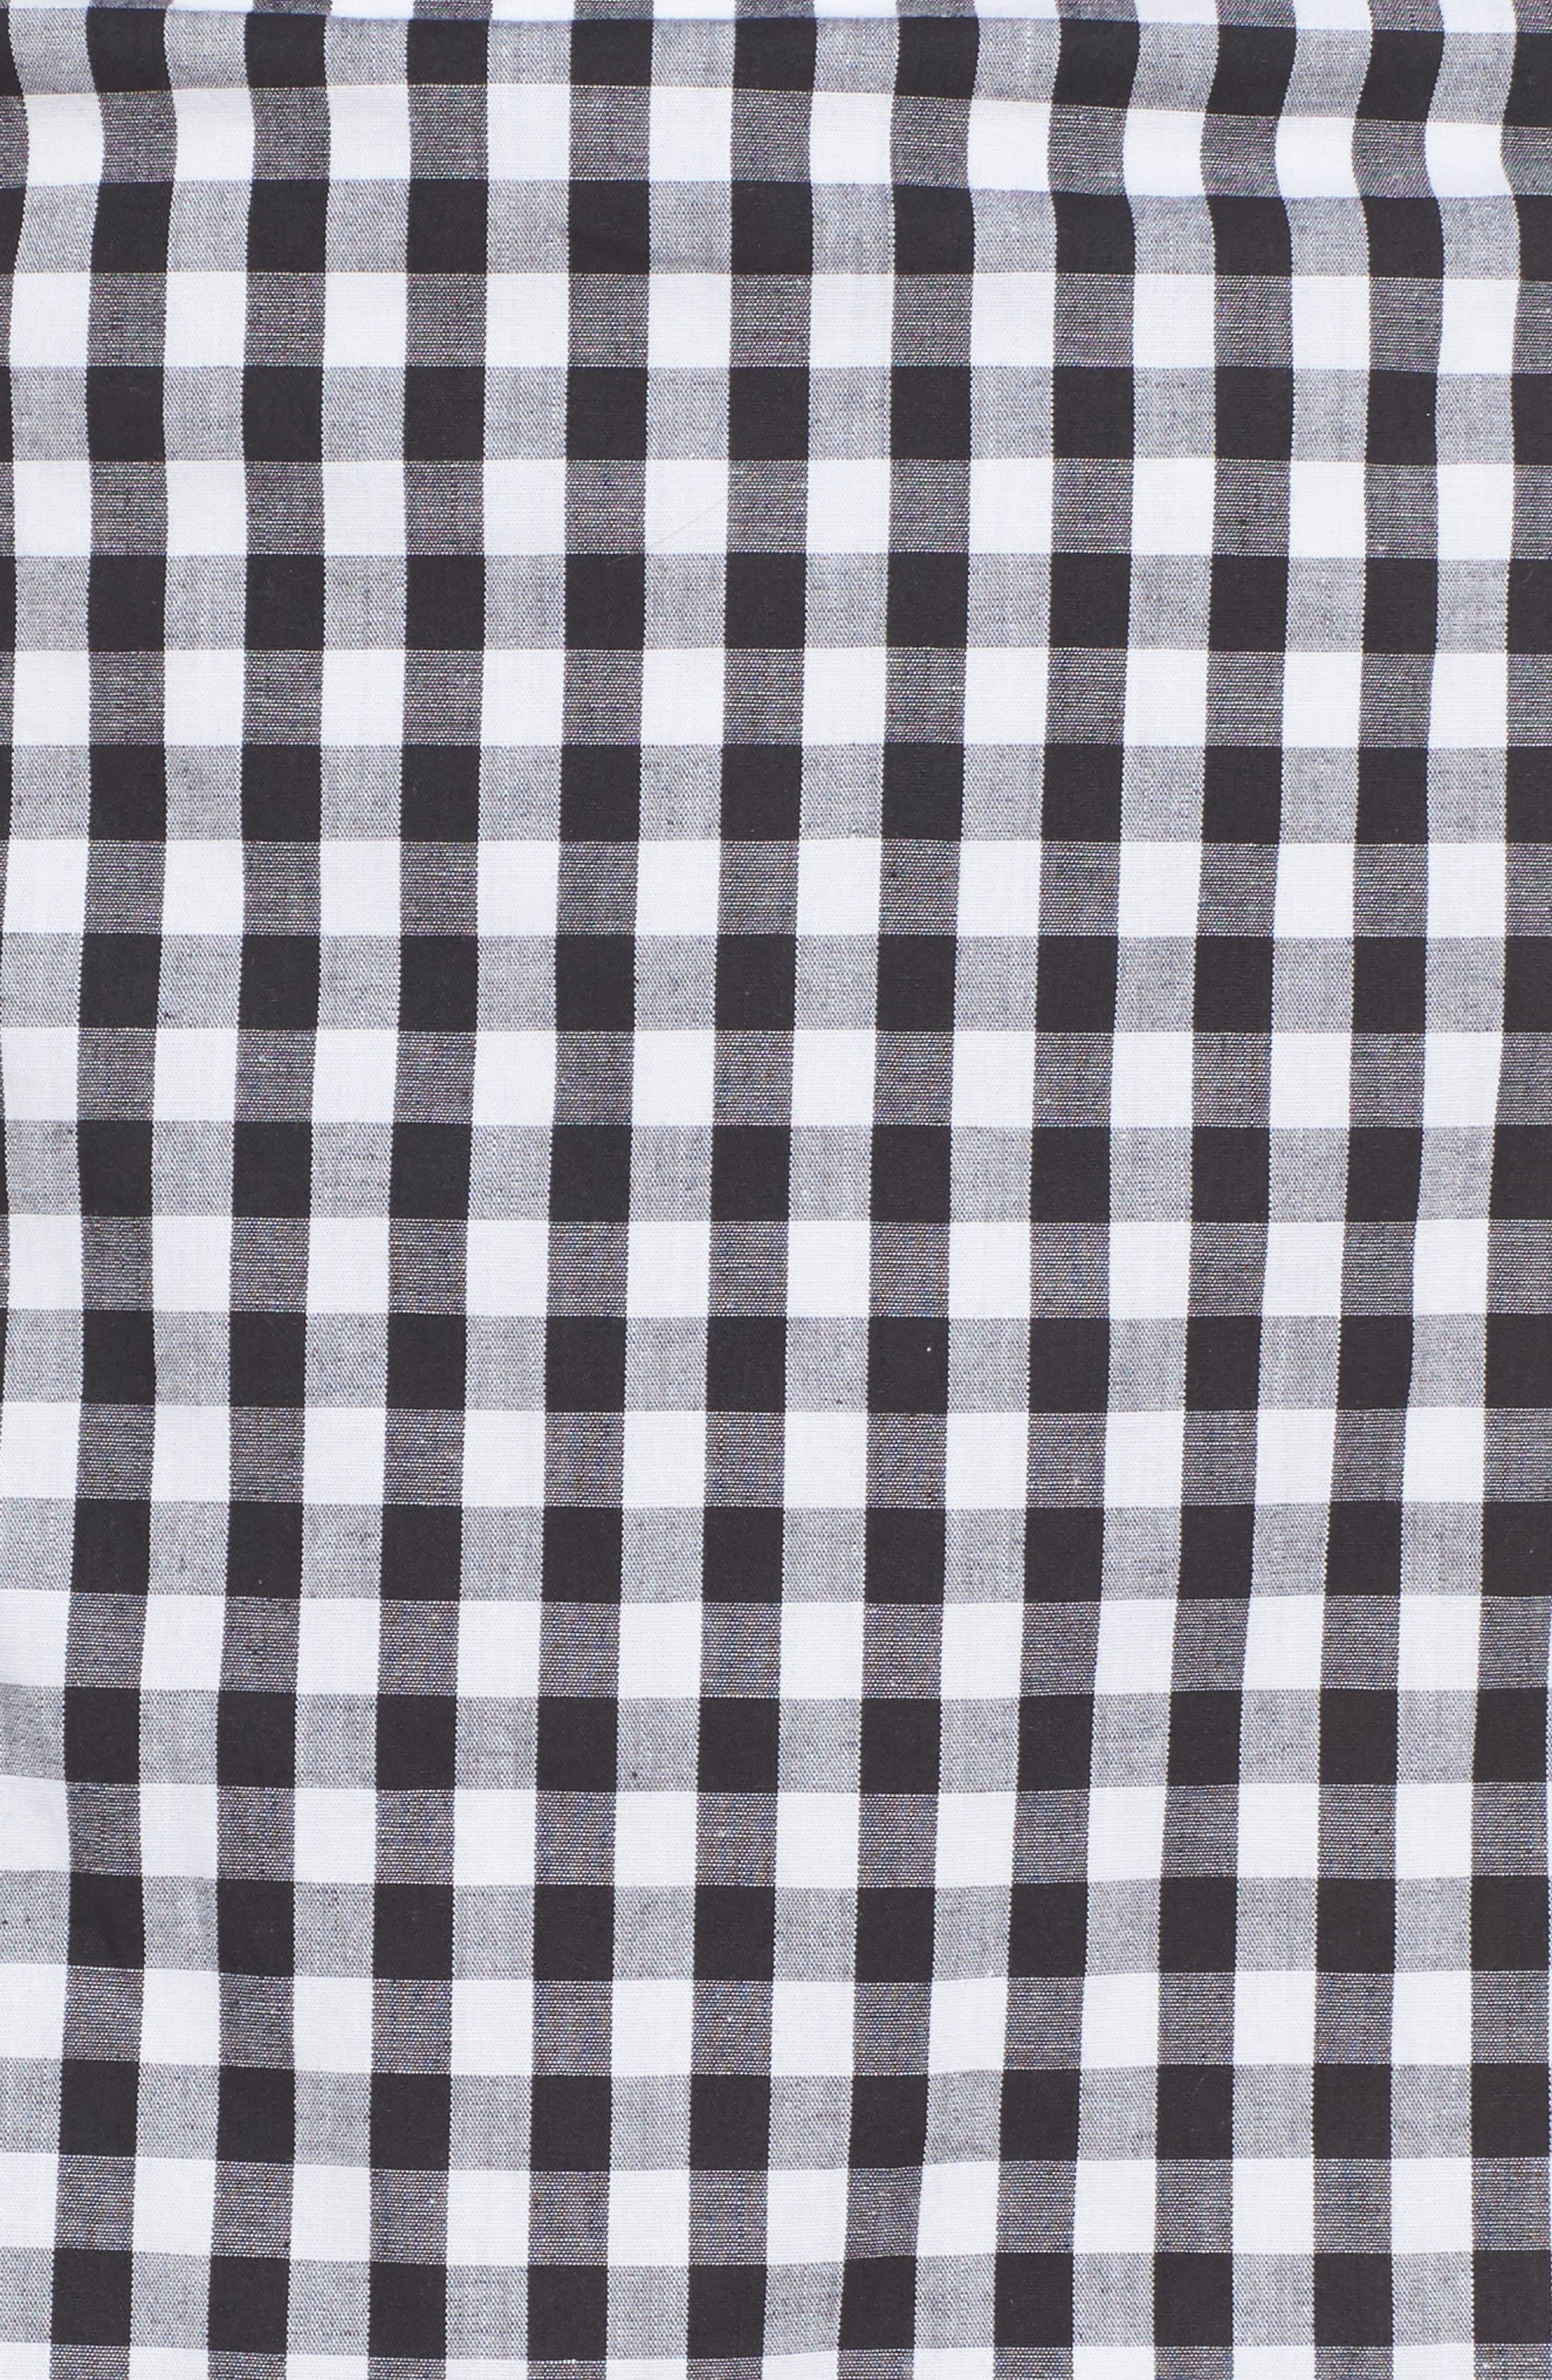 Cinci Wrap Skirt,                             Alternate thumbnail 4, color,                             Black/ White